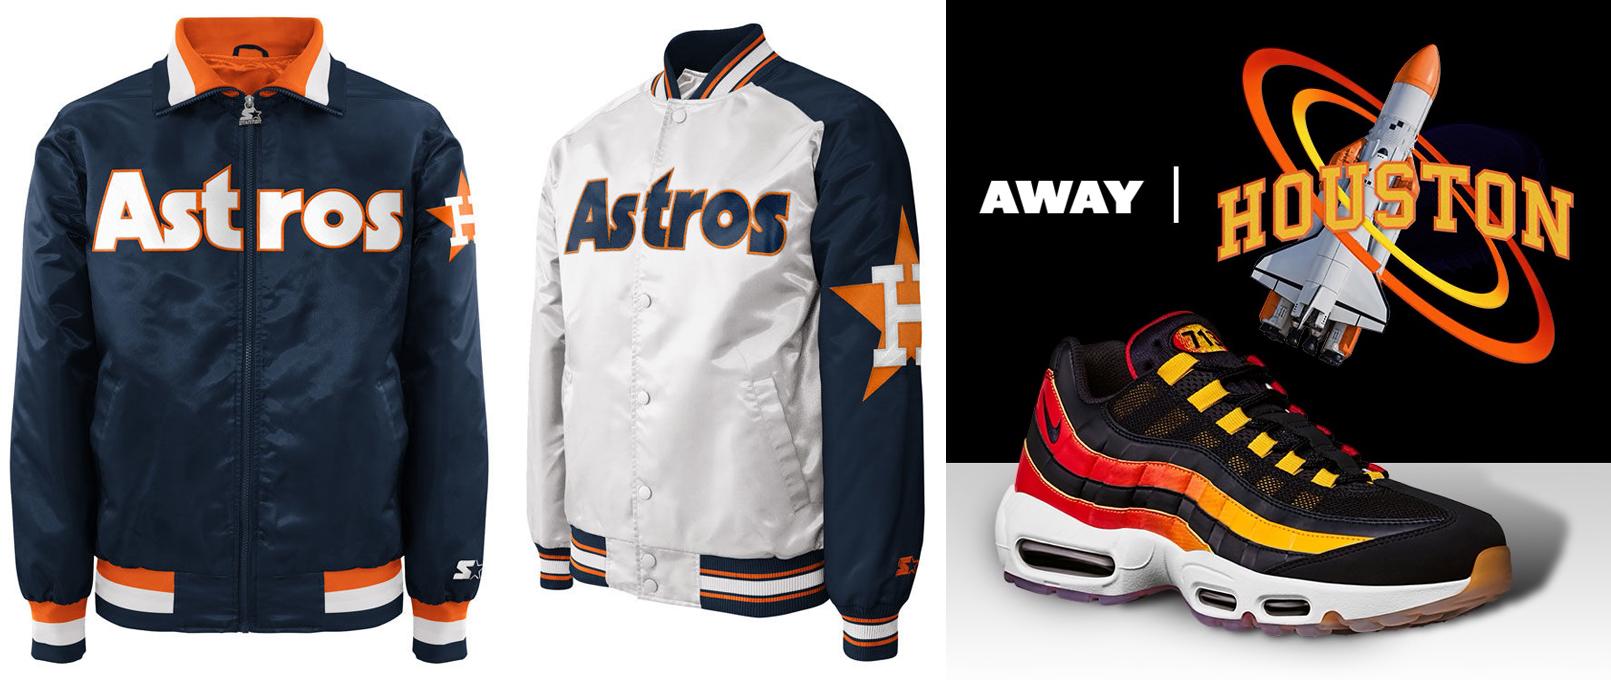 low priced 482fa 94e61 Nike Air Max 95 Houston Away Astros Jacket | SneakerFits.com